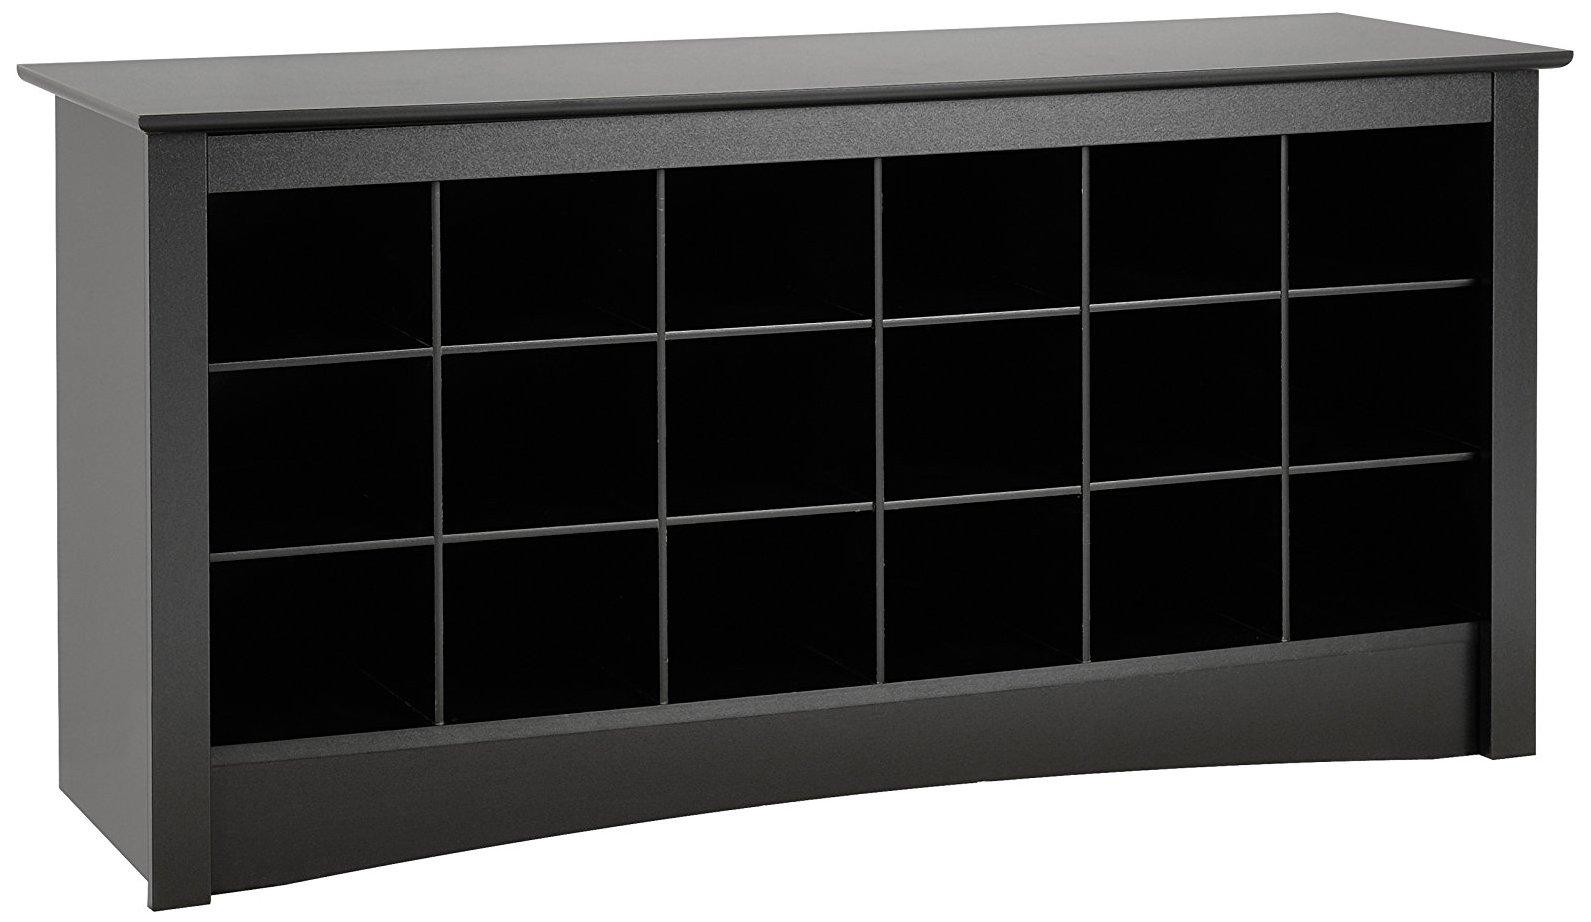 Black Shoe Storage Cubbie Bench by Prepac